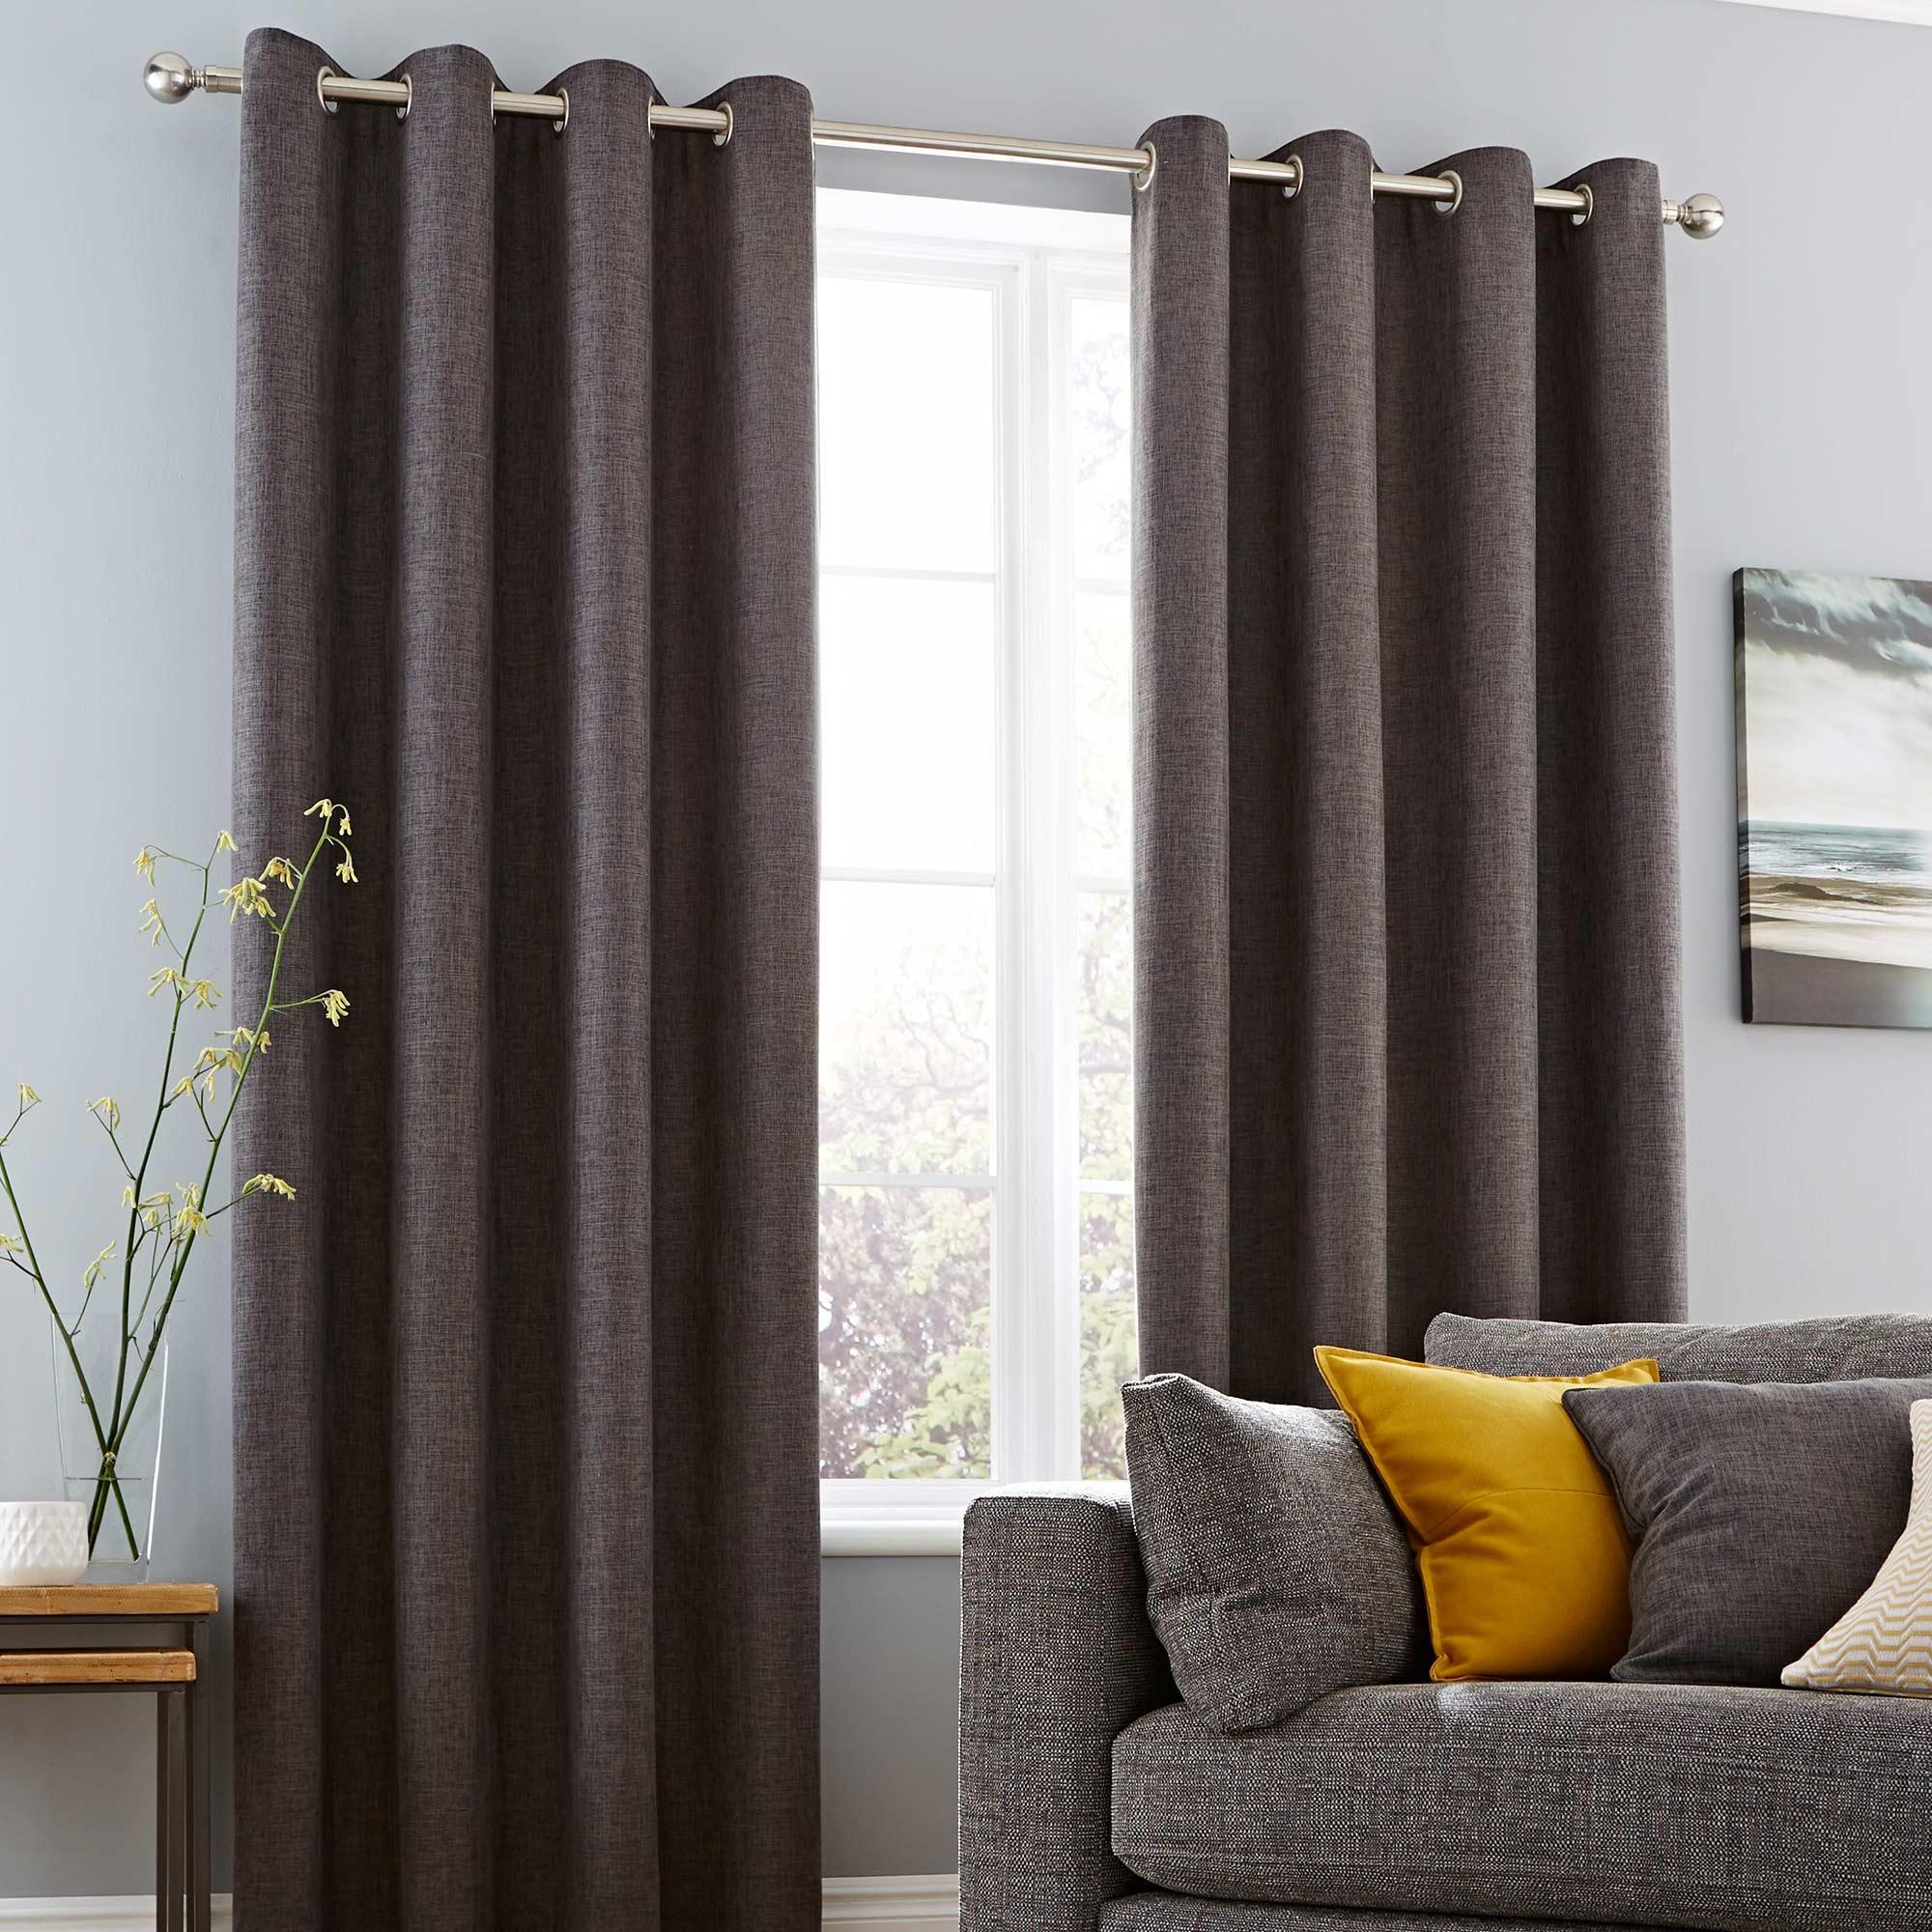 vermont charcoal lined eyelet curtains XVWNHXZ